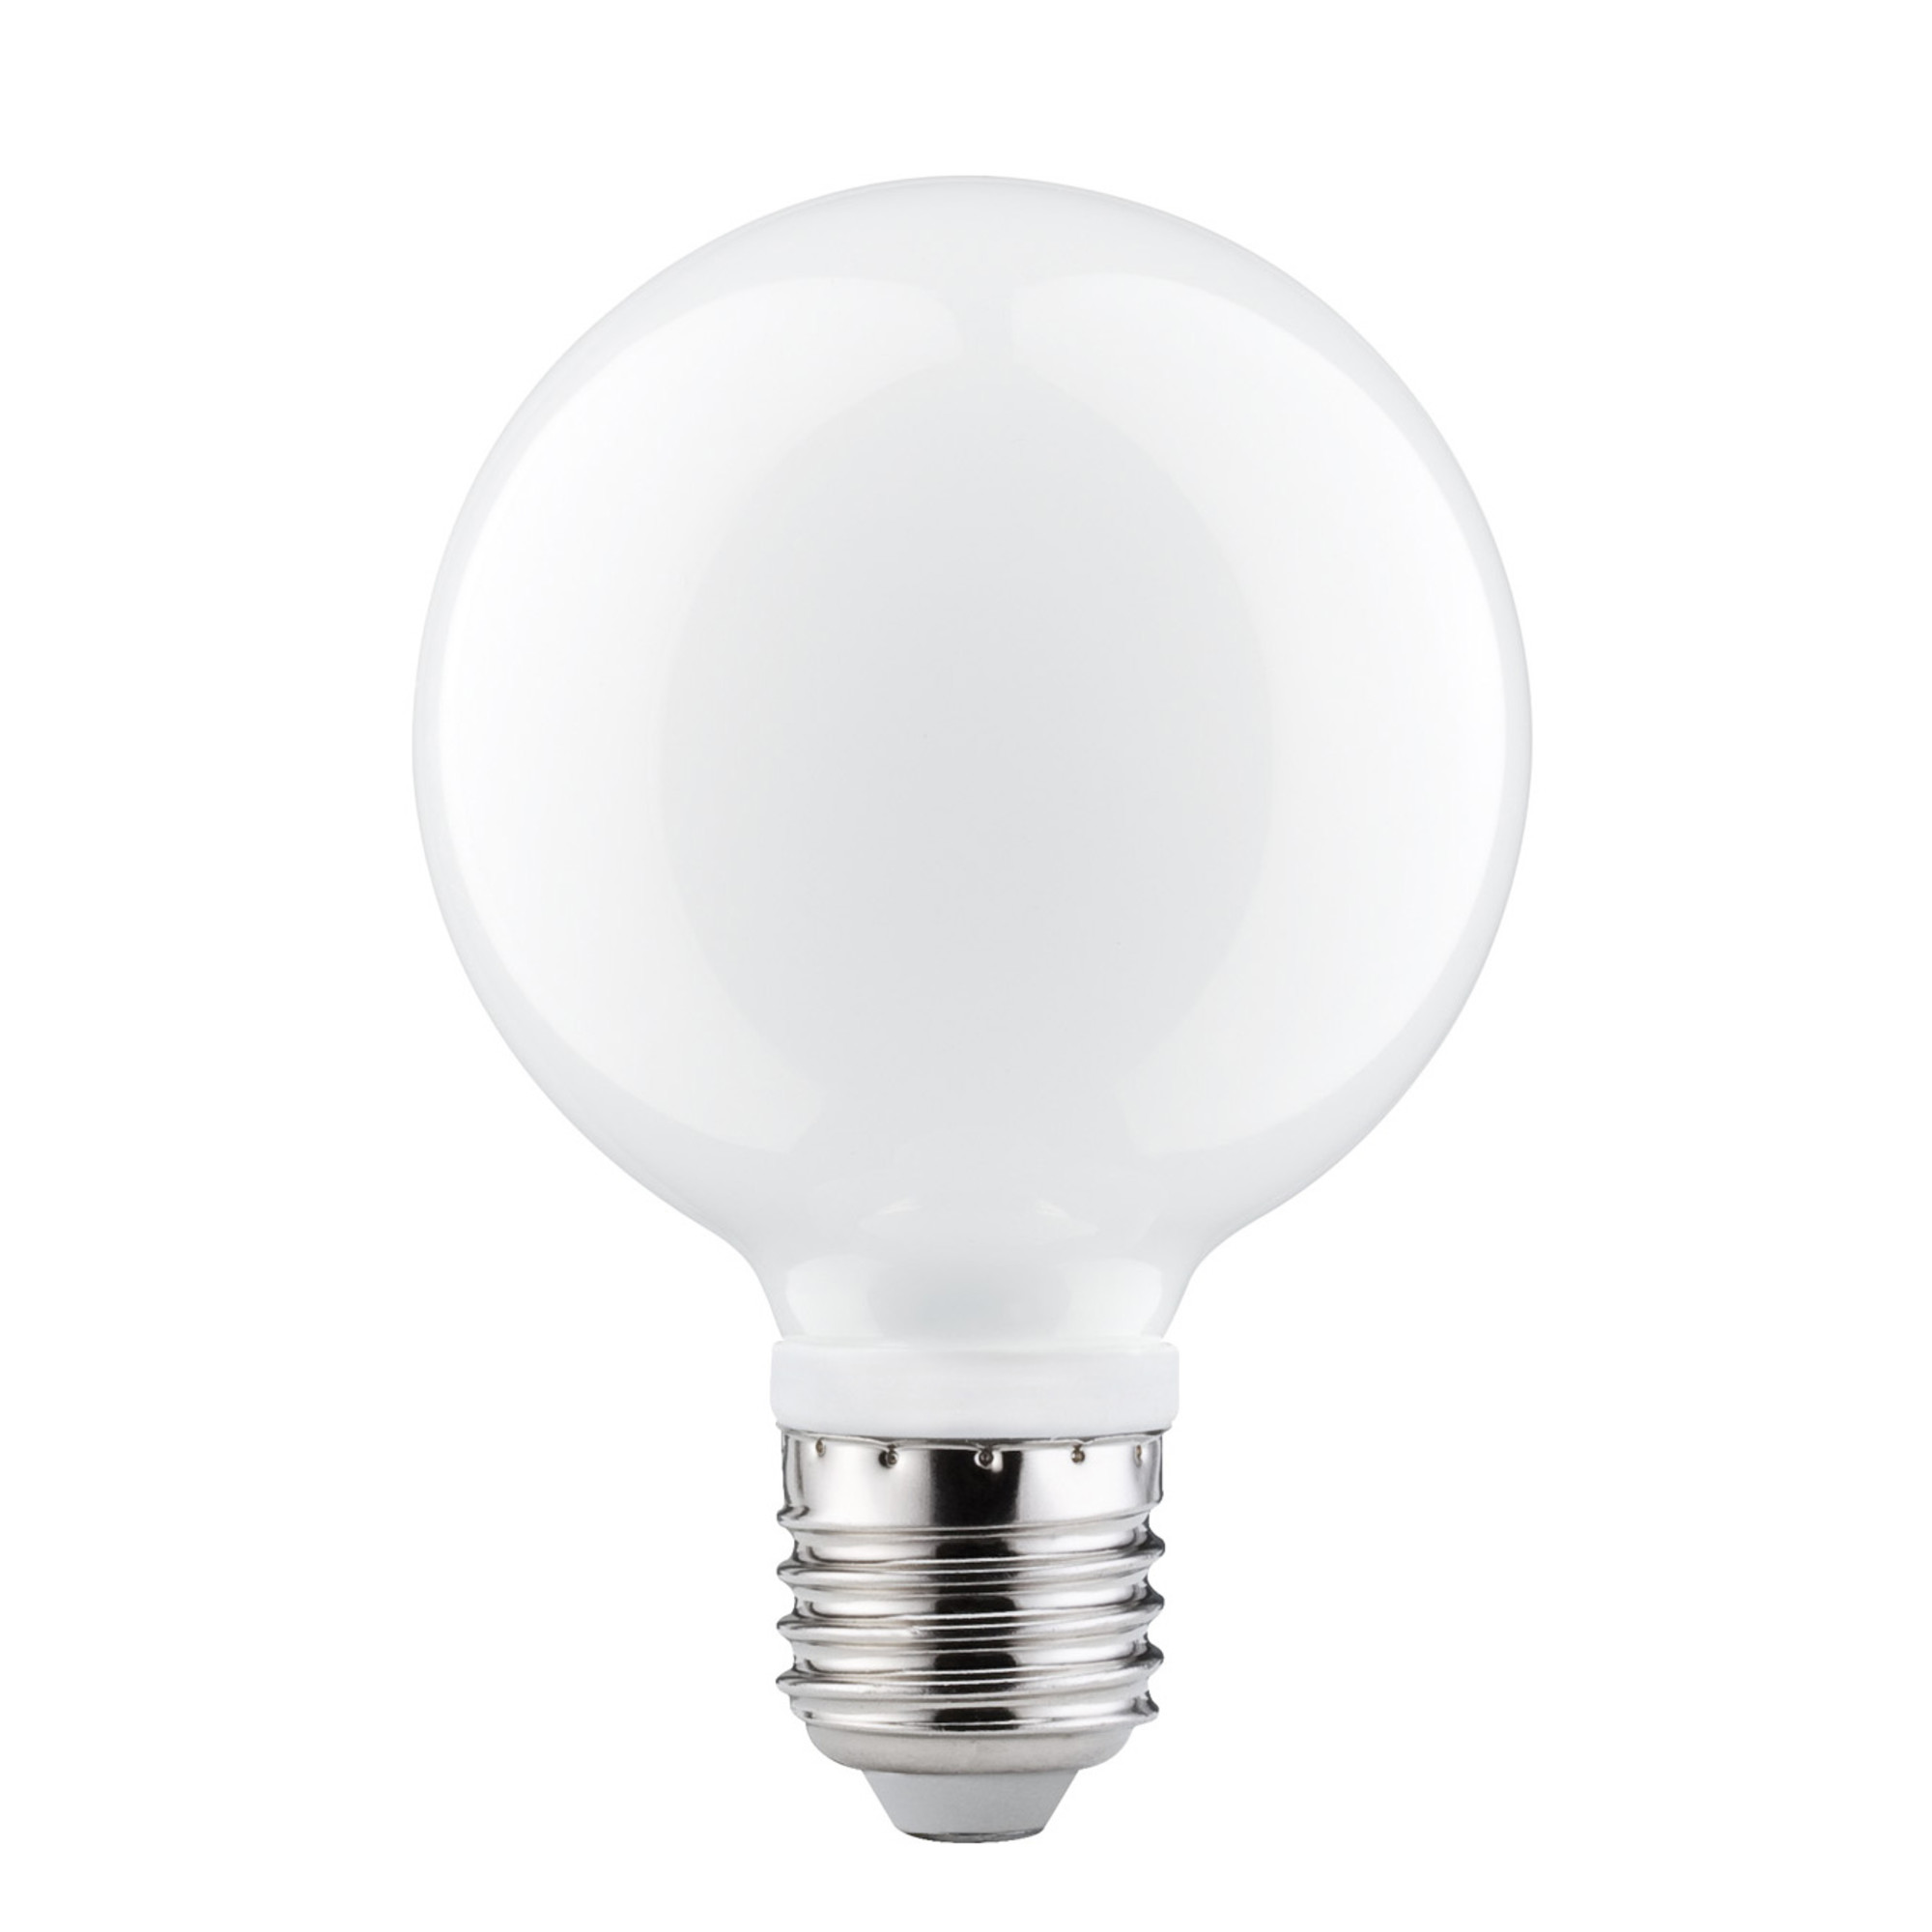 Лампа светодиодная Paulmann 28280 E27 470 Лм теплый свет